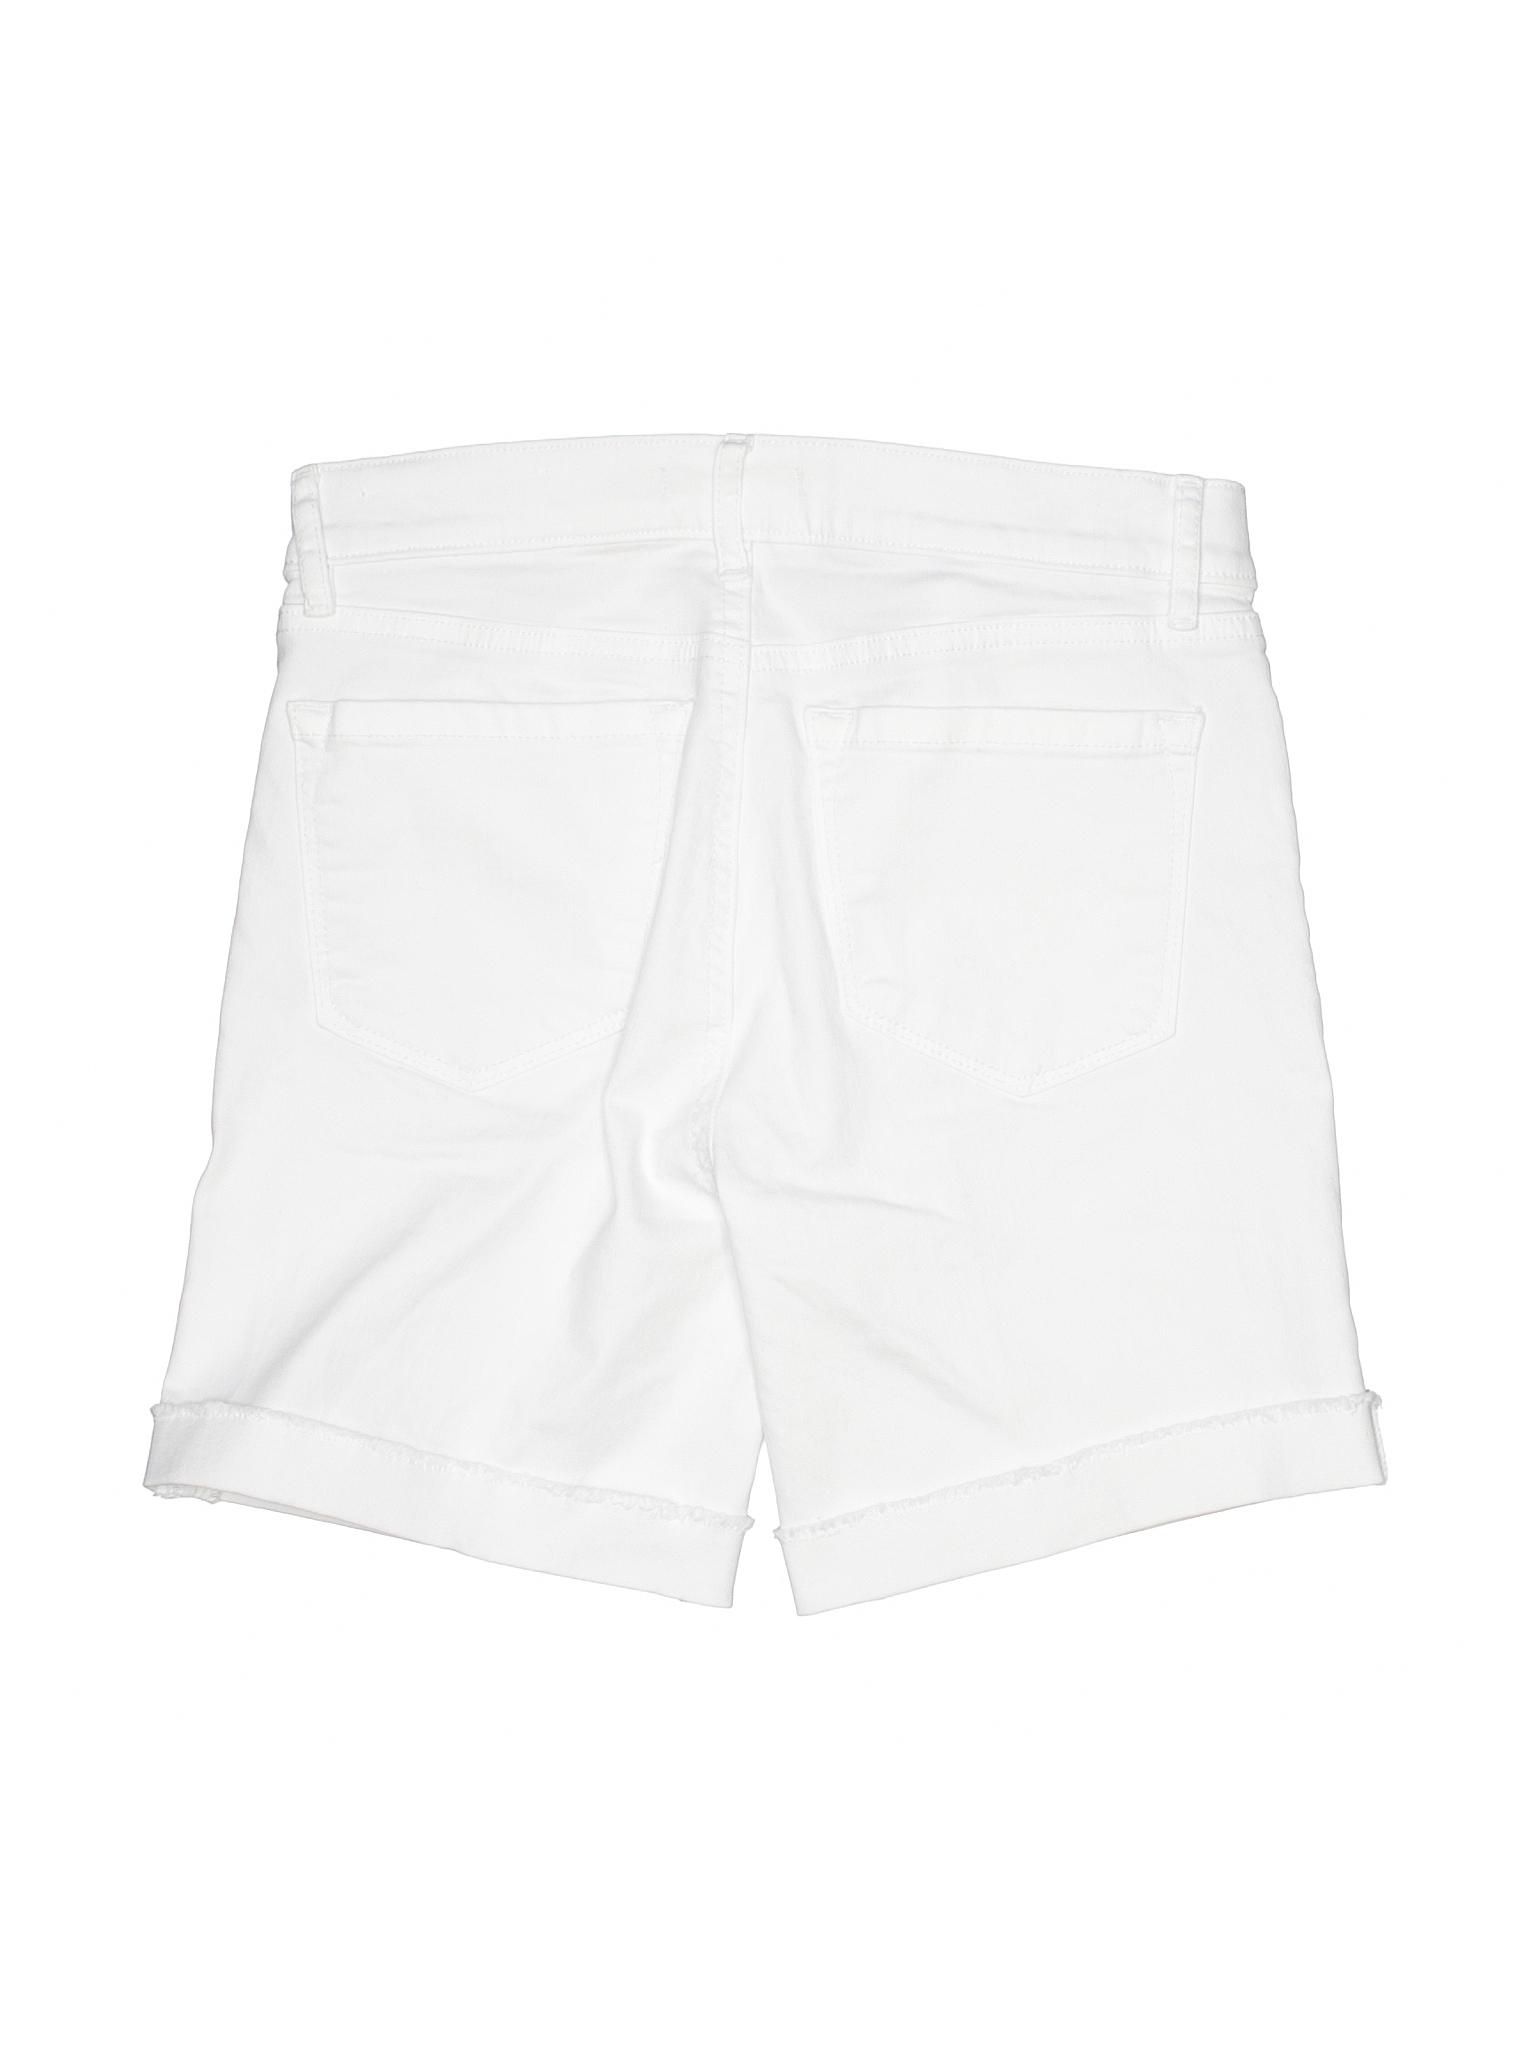 Boutique Denim Shorts Taylor LOFT Ann leisure zwzT6q8a